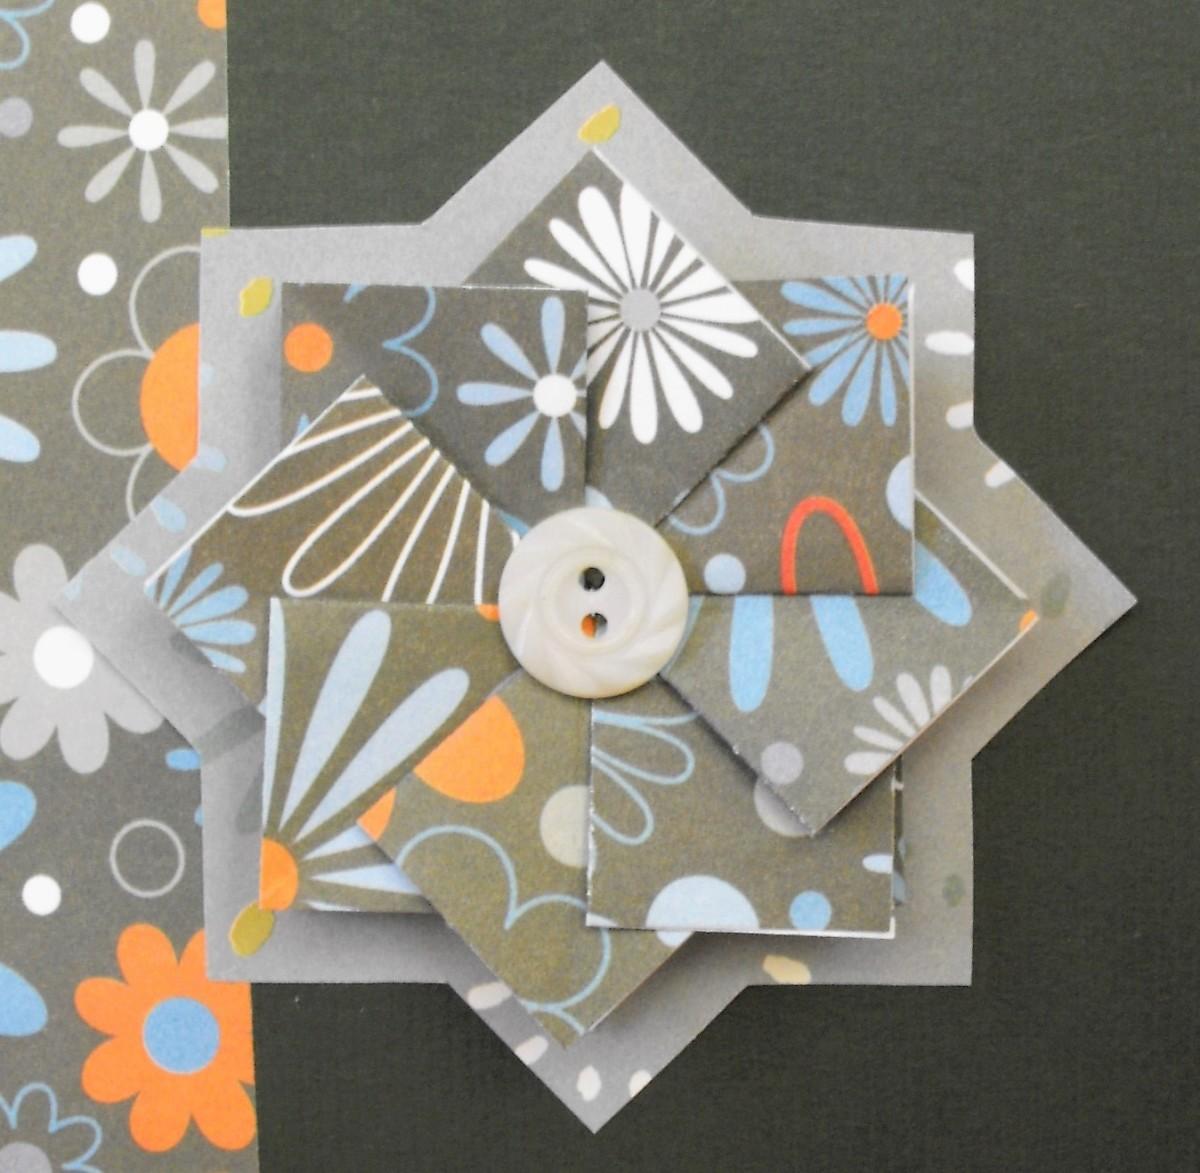 Tea Bag Folding Paper Craft for Children